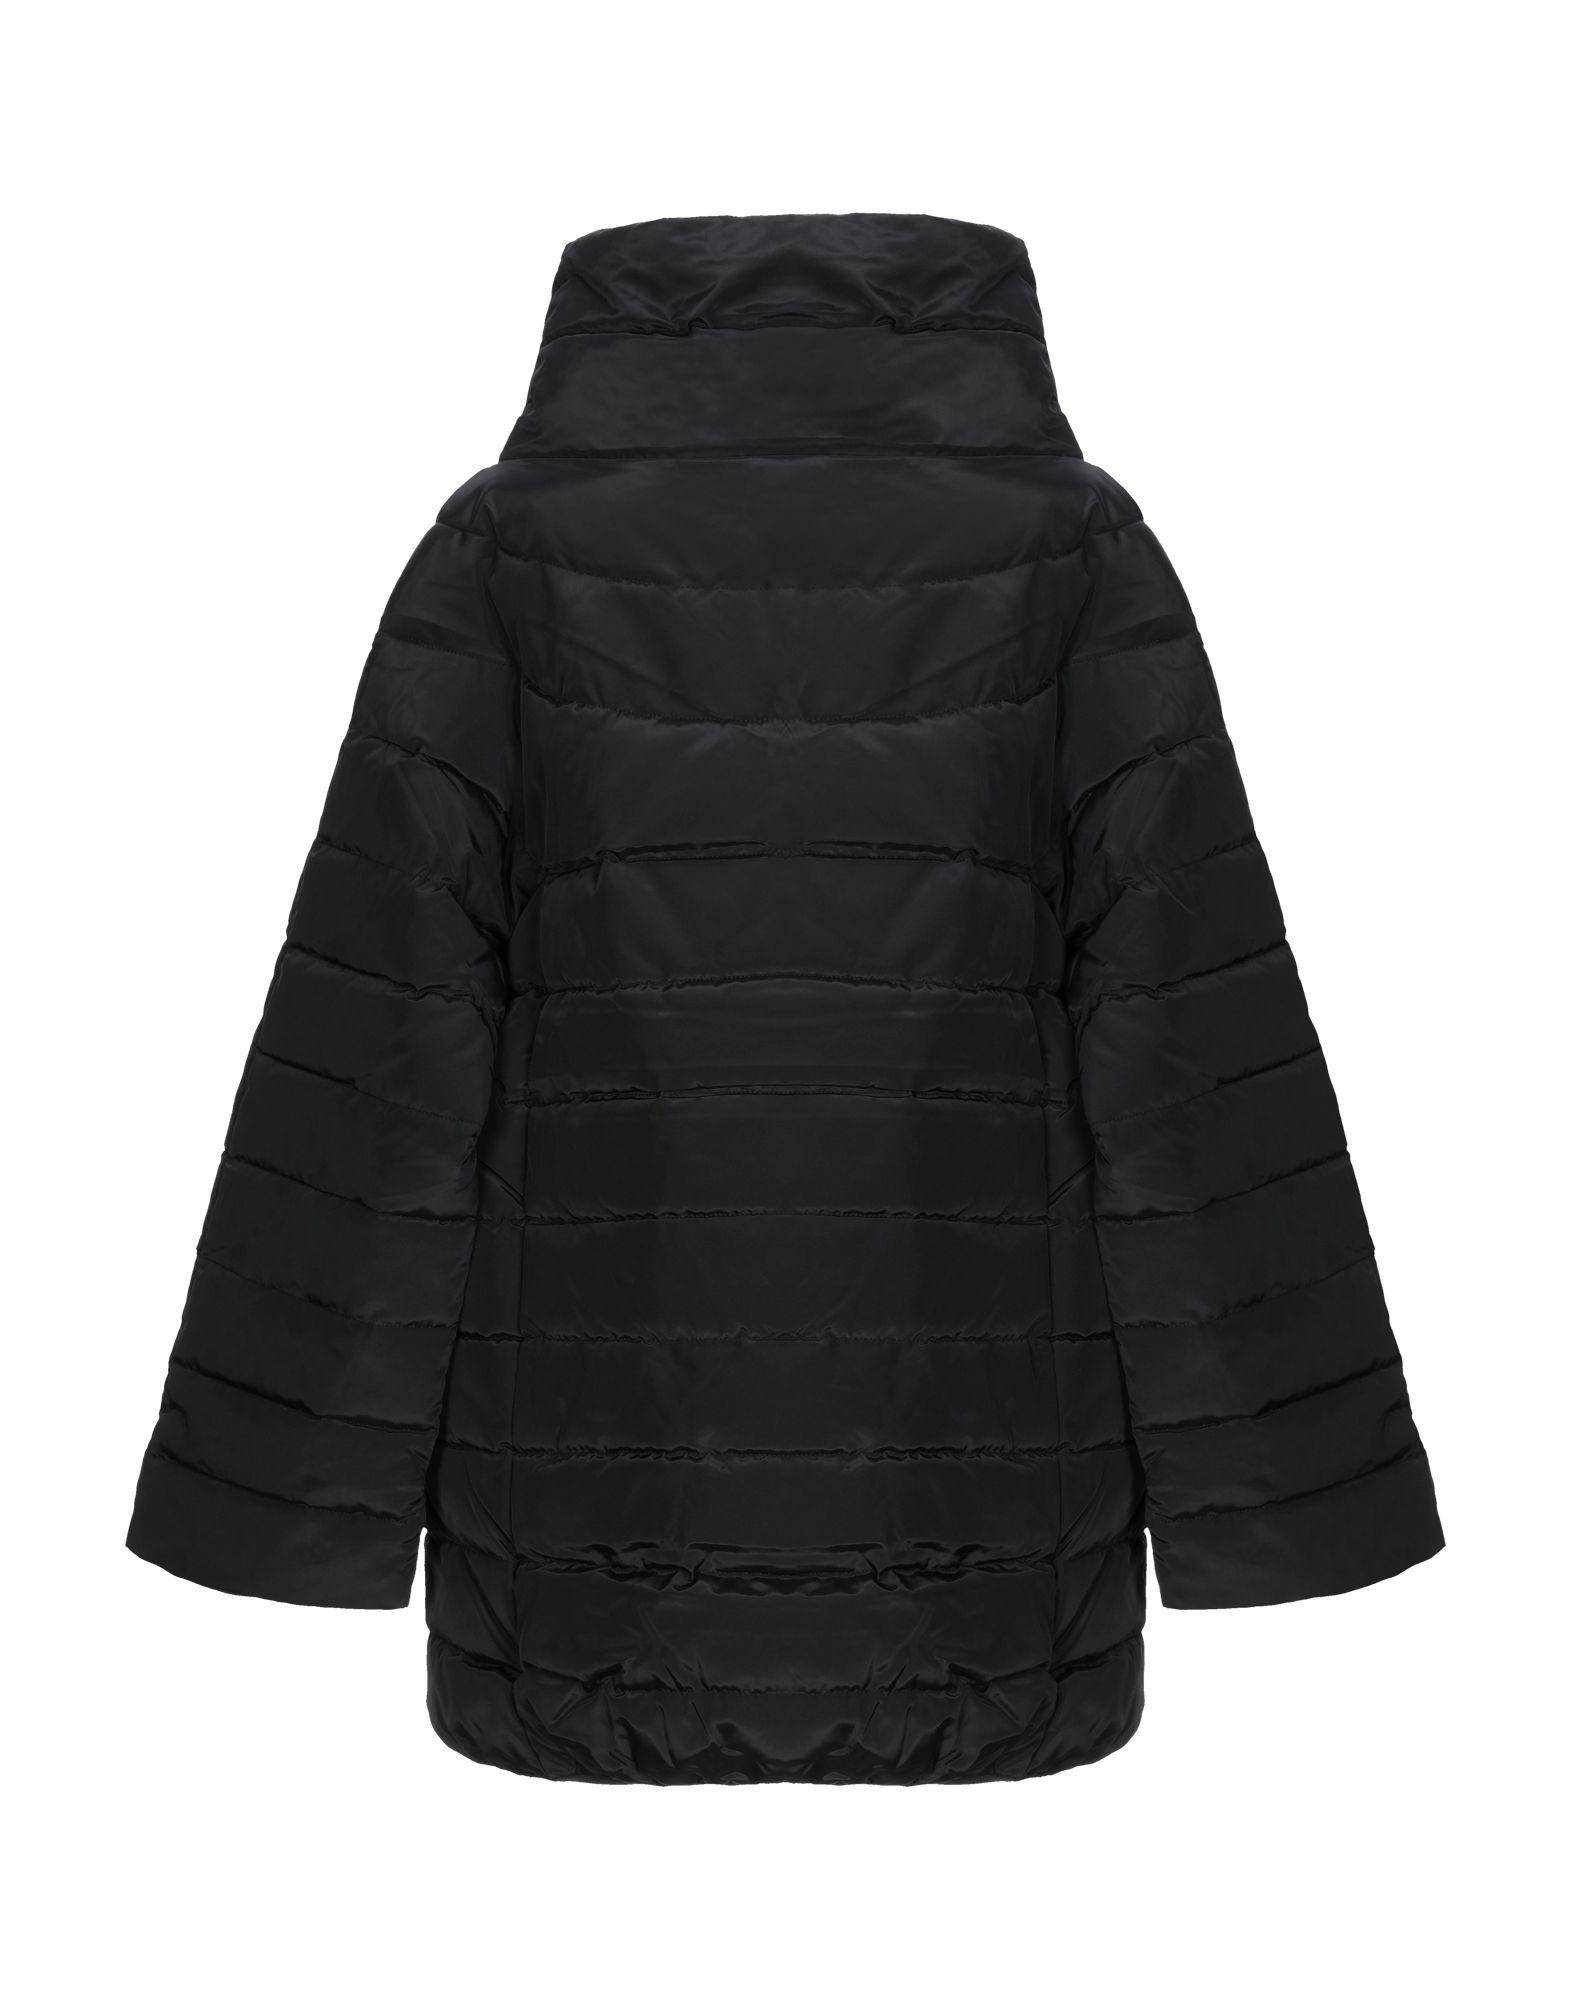 Guess Black Techno Fabric Padded Jacket